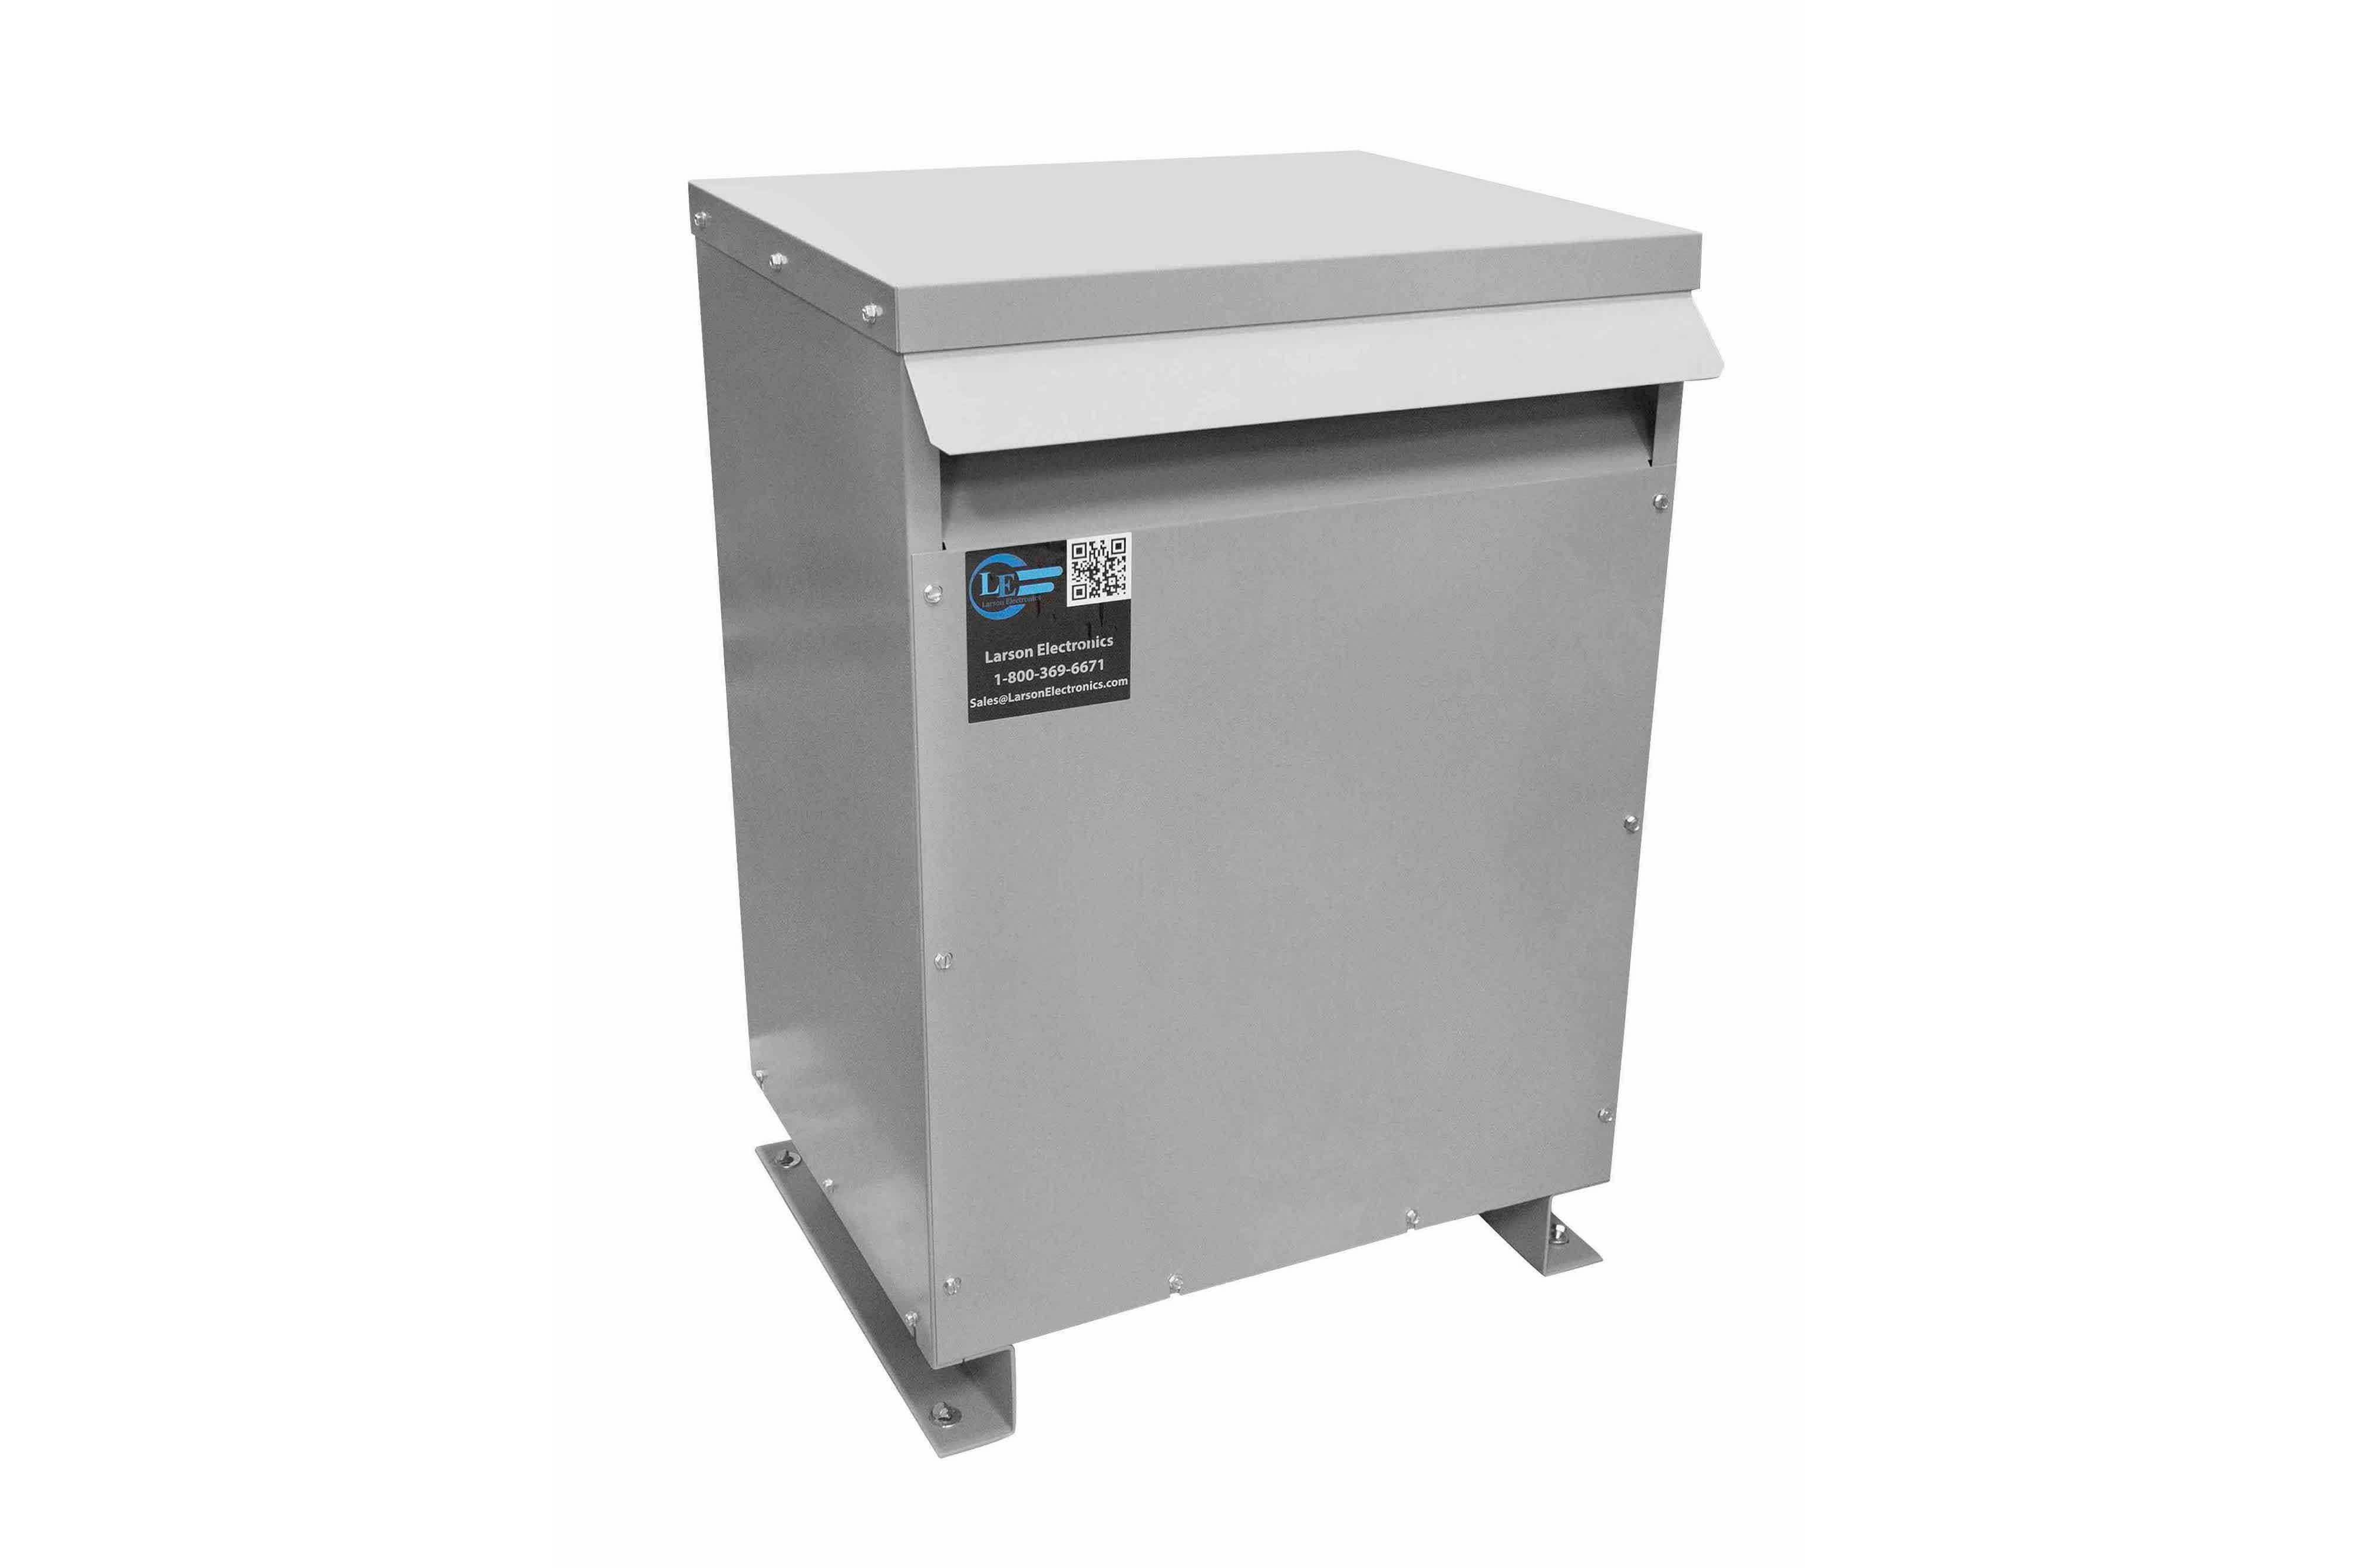 500 kVA 3PH Isolation Transformer, 460V Wye Primary, 208V Delta Secondary, N3R, Ventilated, 60 Hz